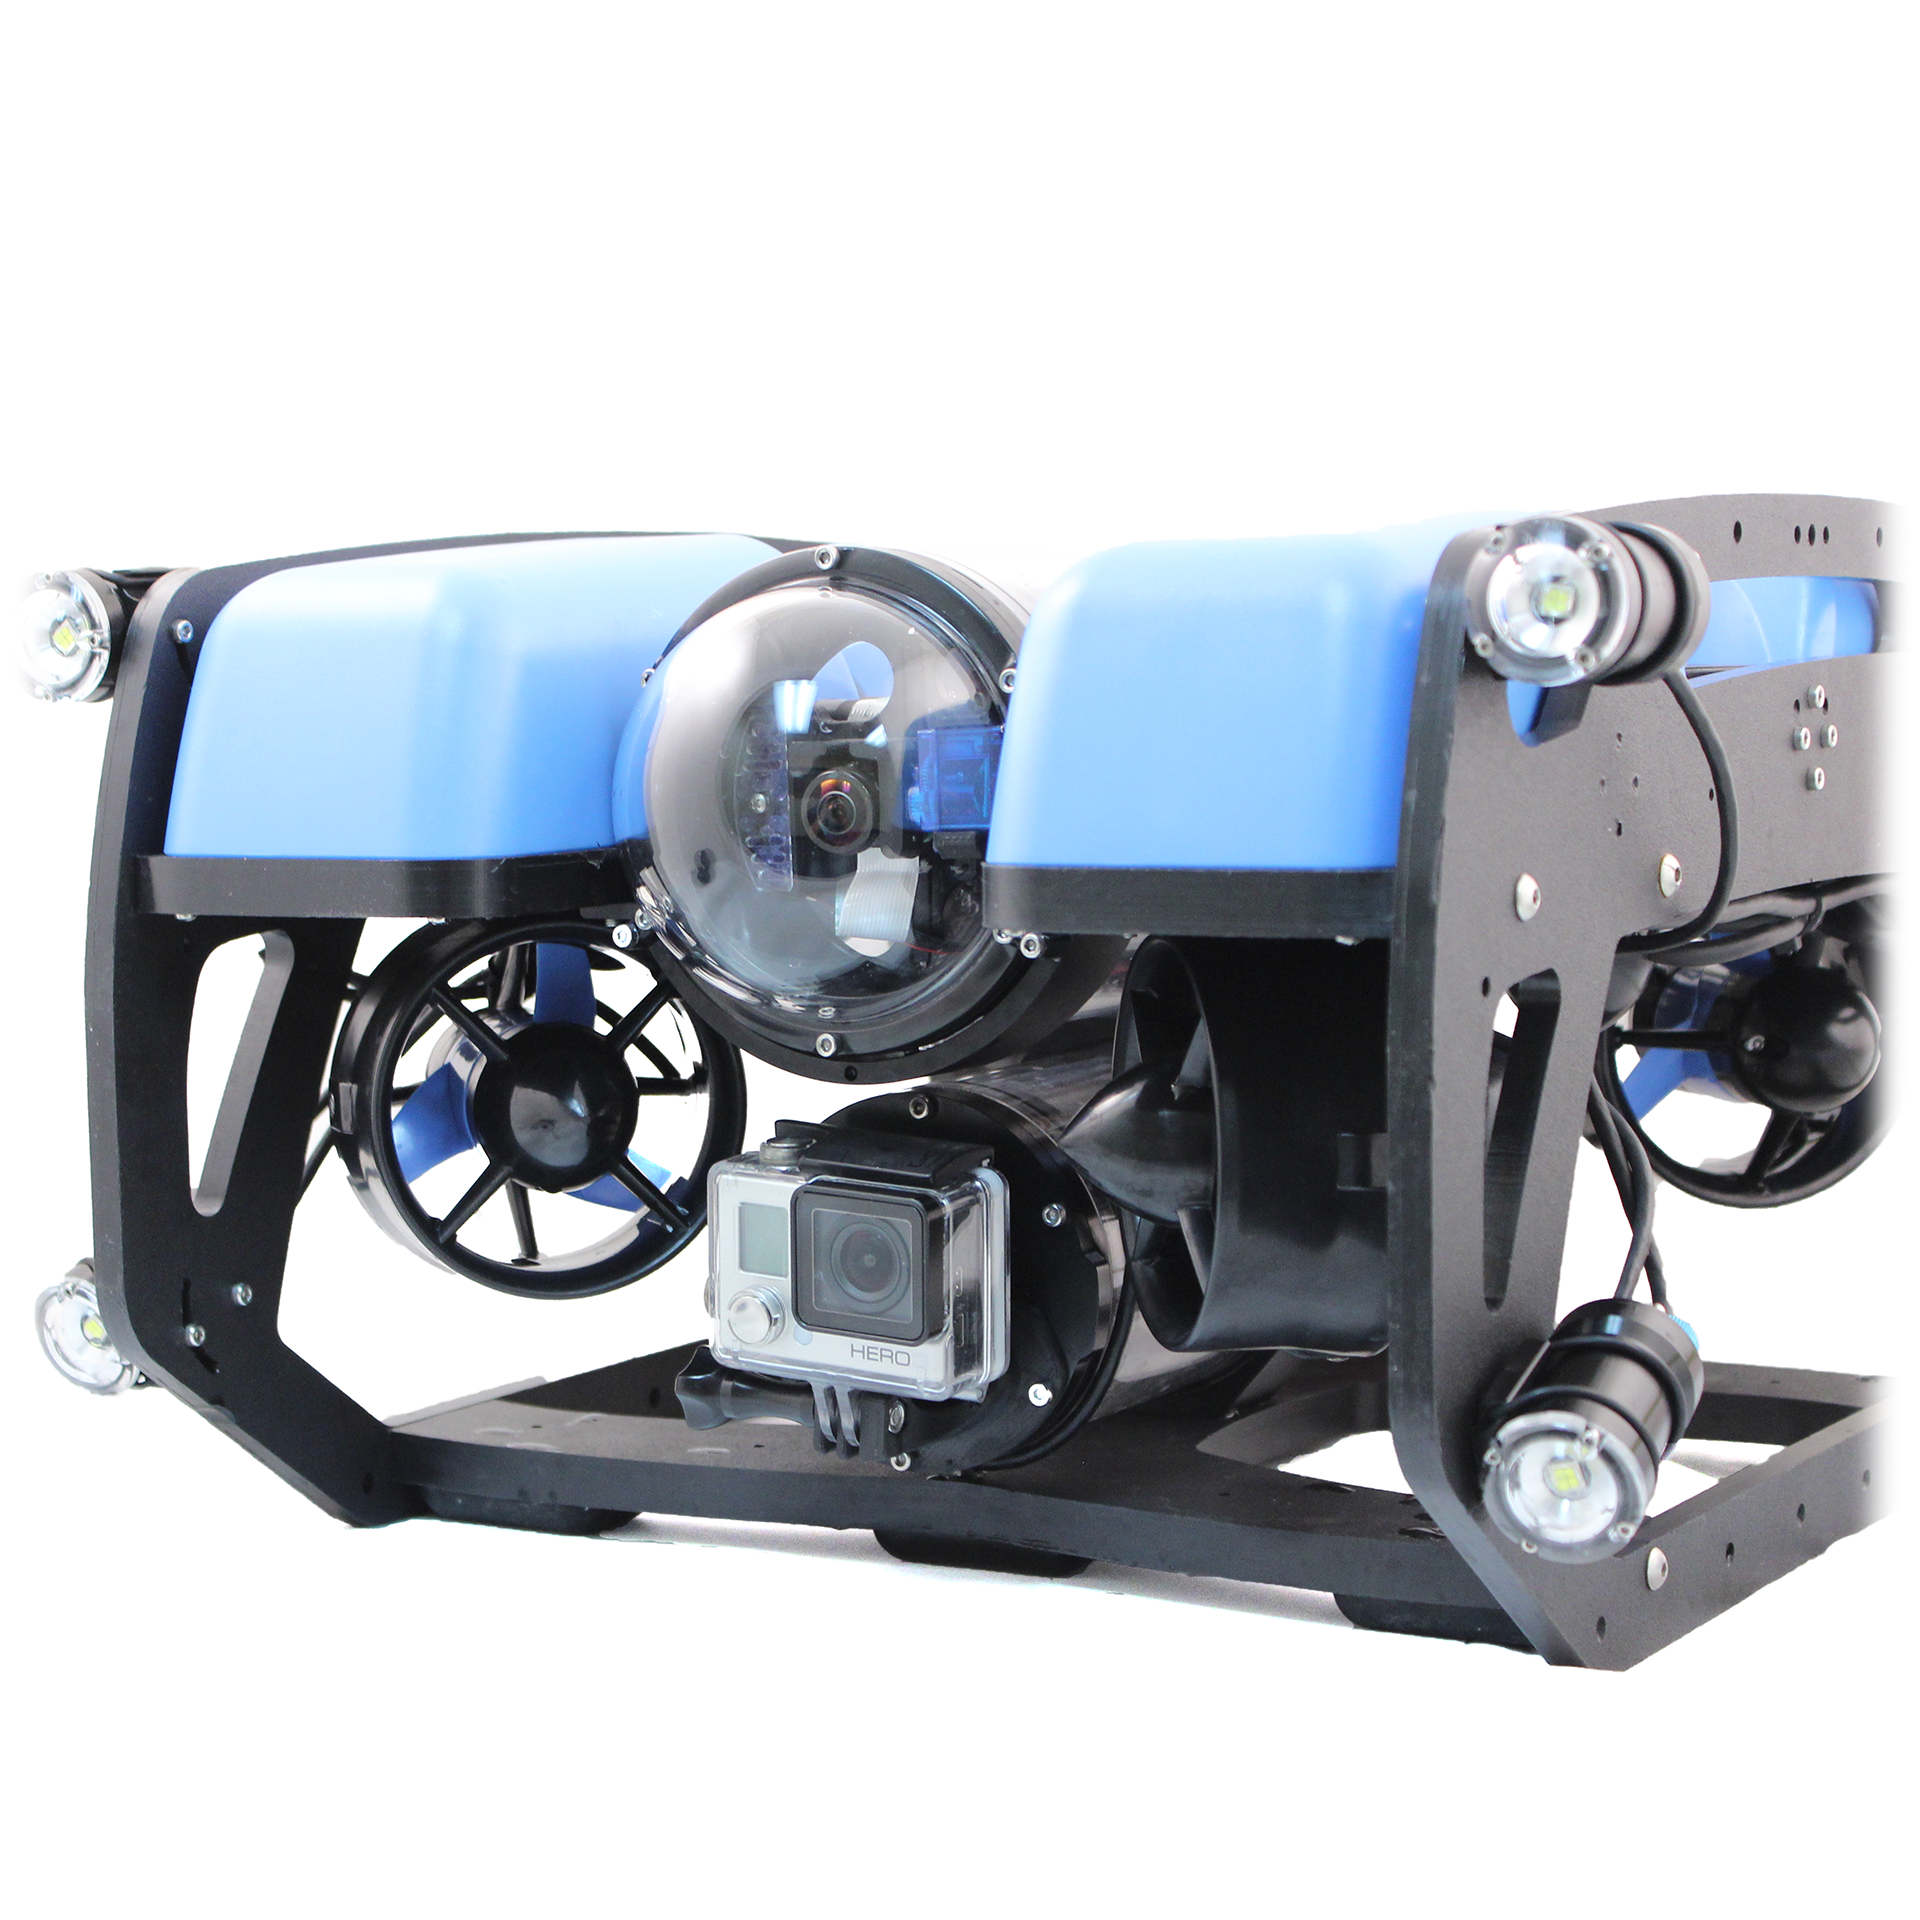 Inspeções subaquáticas – ROV (Remotely Operated Vehicle)